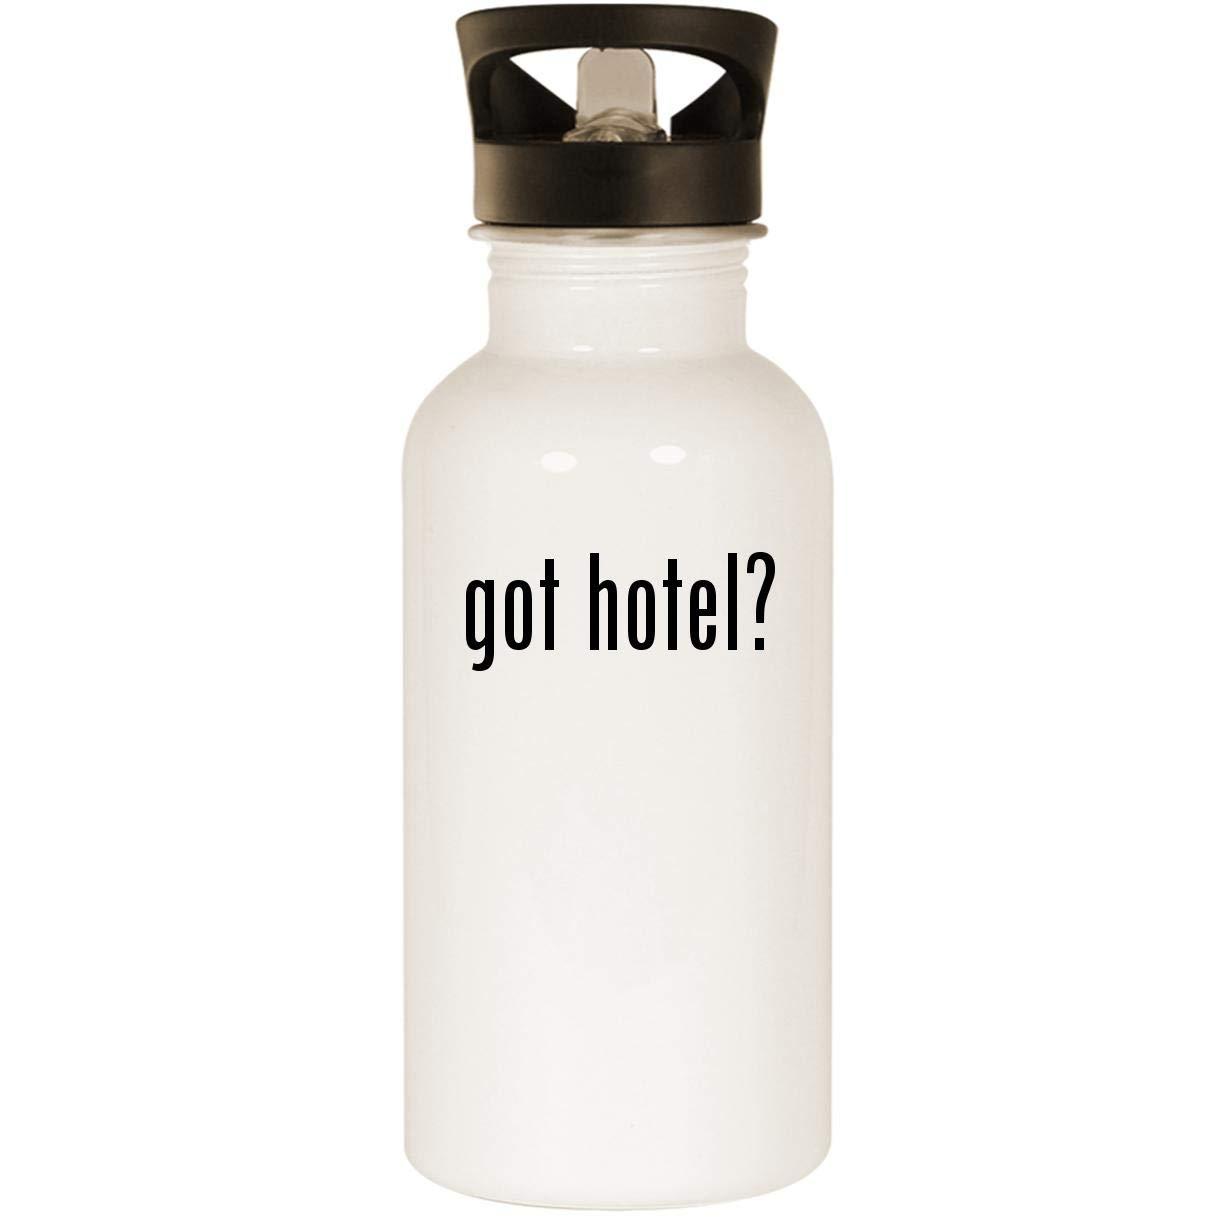 got hotel? - Stainless Steel 20oz Road Ready Water Bottle, White